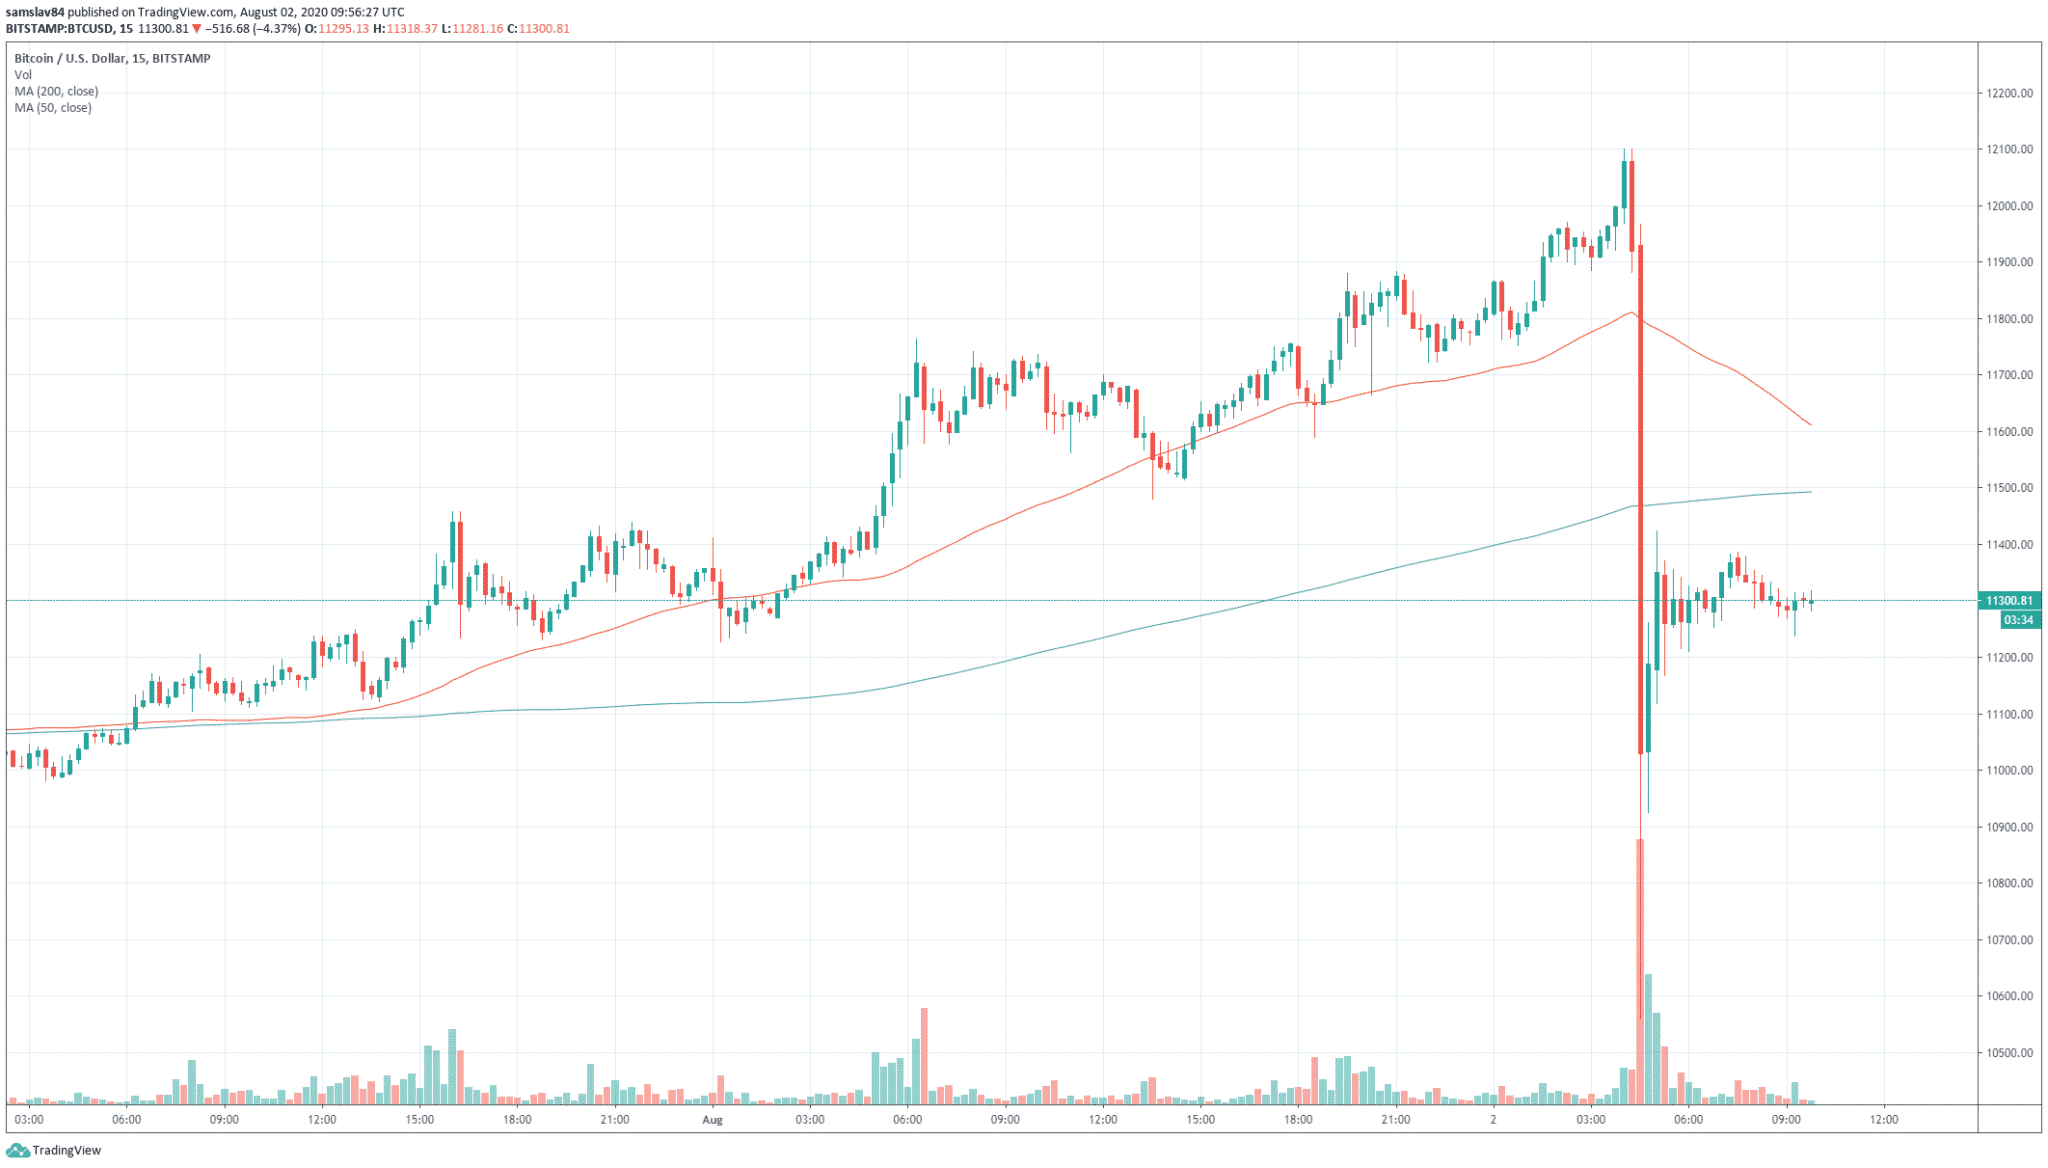 15m BTC/USD - Bitstamp